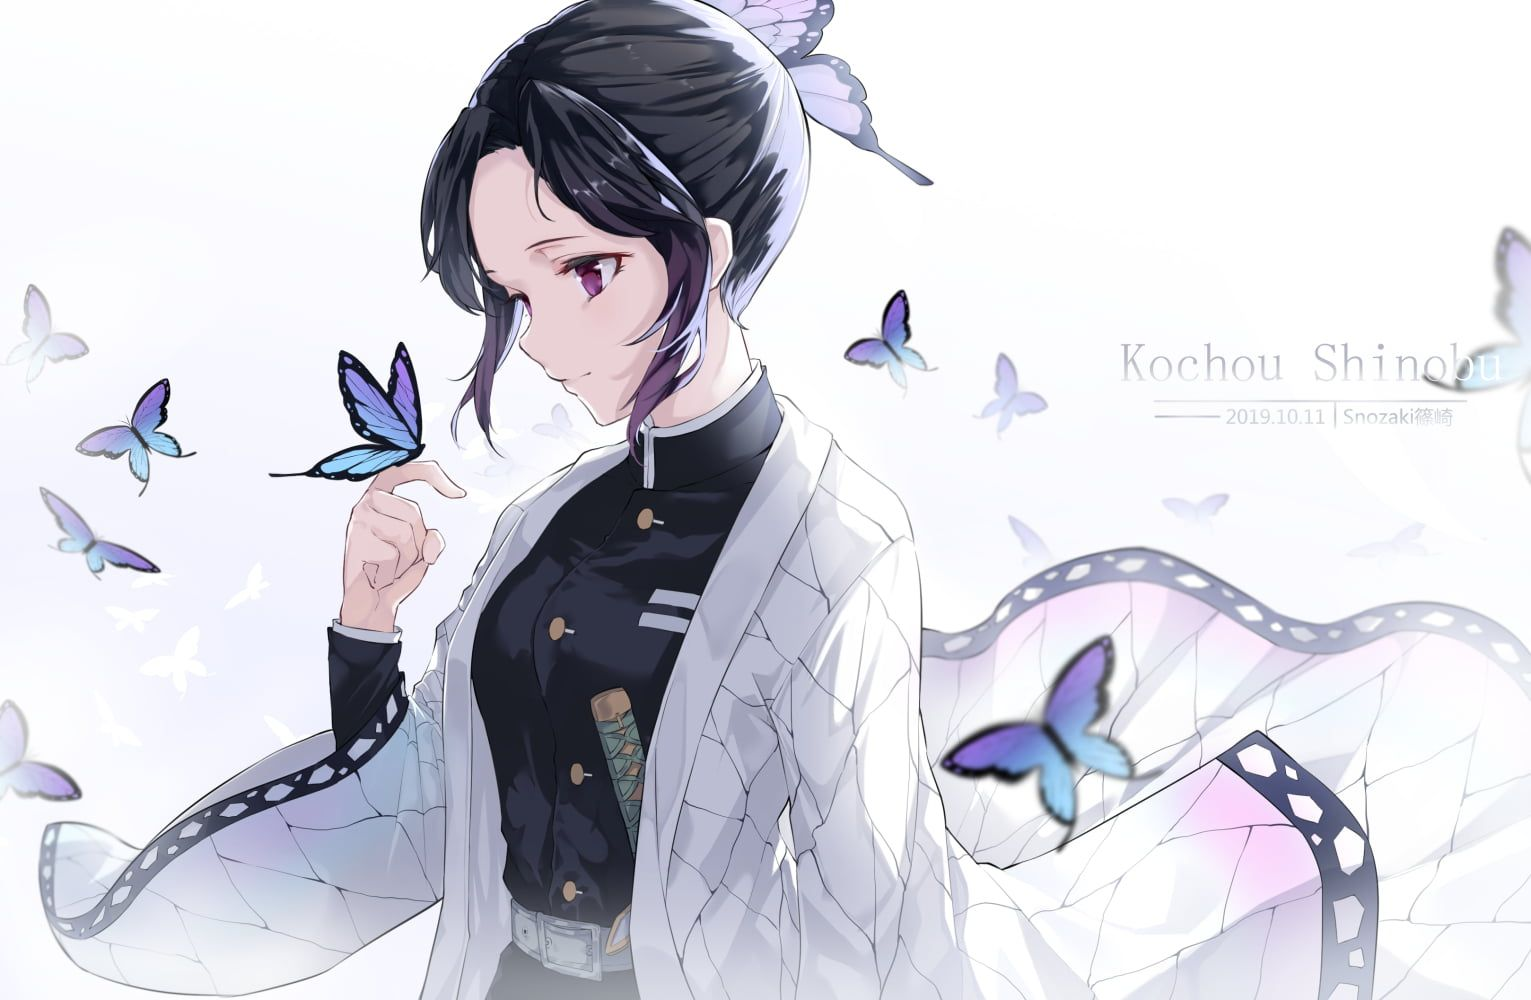 Kimetsu No Yaiba Kochou Shinobu Butterfly Weapon Katana Black Hair Uniform Japanese Clothes Short Hair Sword 720p Wallpaper H In 2020 Anime Katana Hd Wallpaper